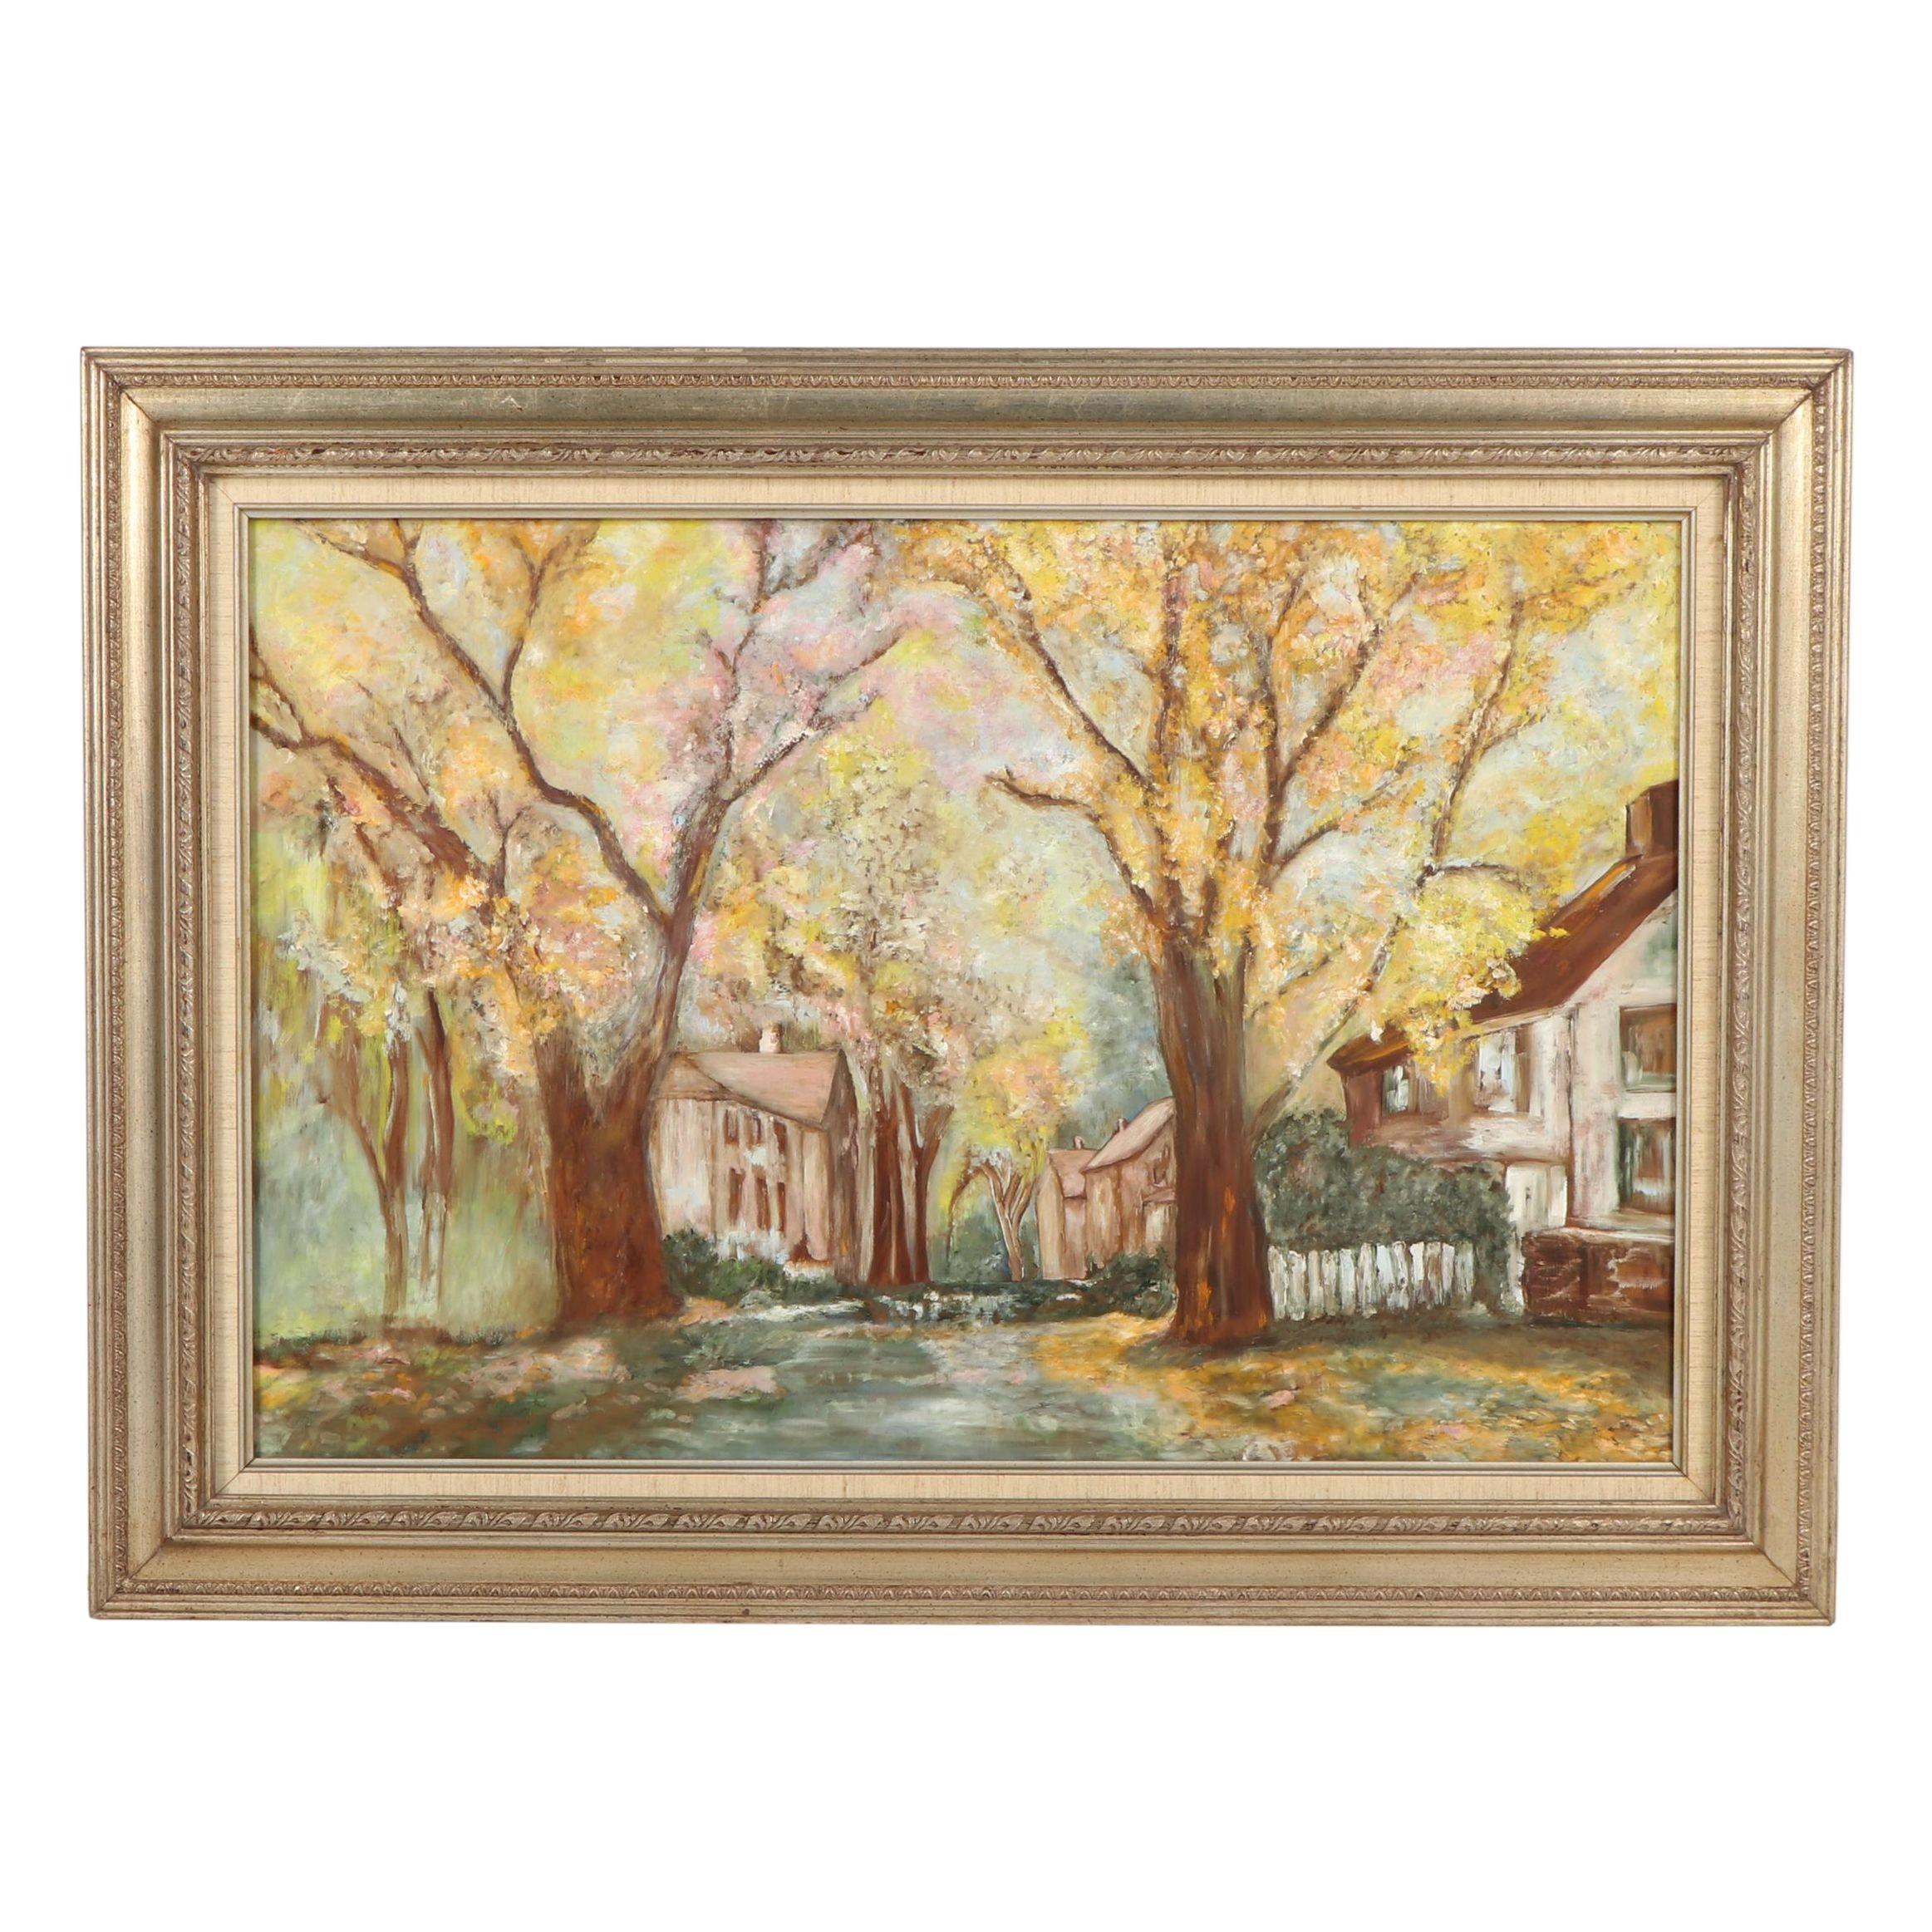 Oil Painting of Neighborhood Street Scene